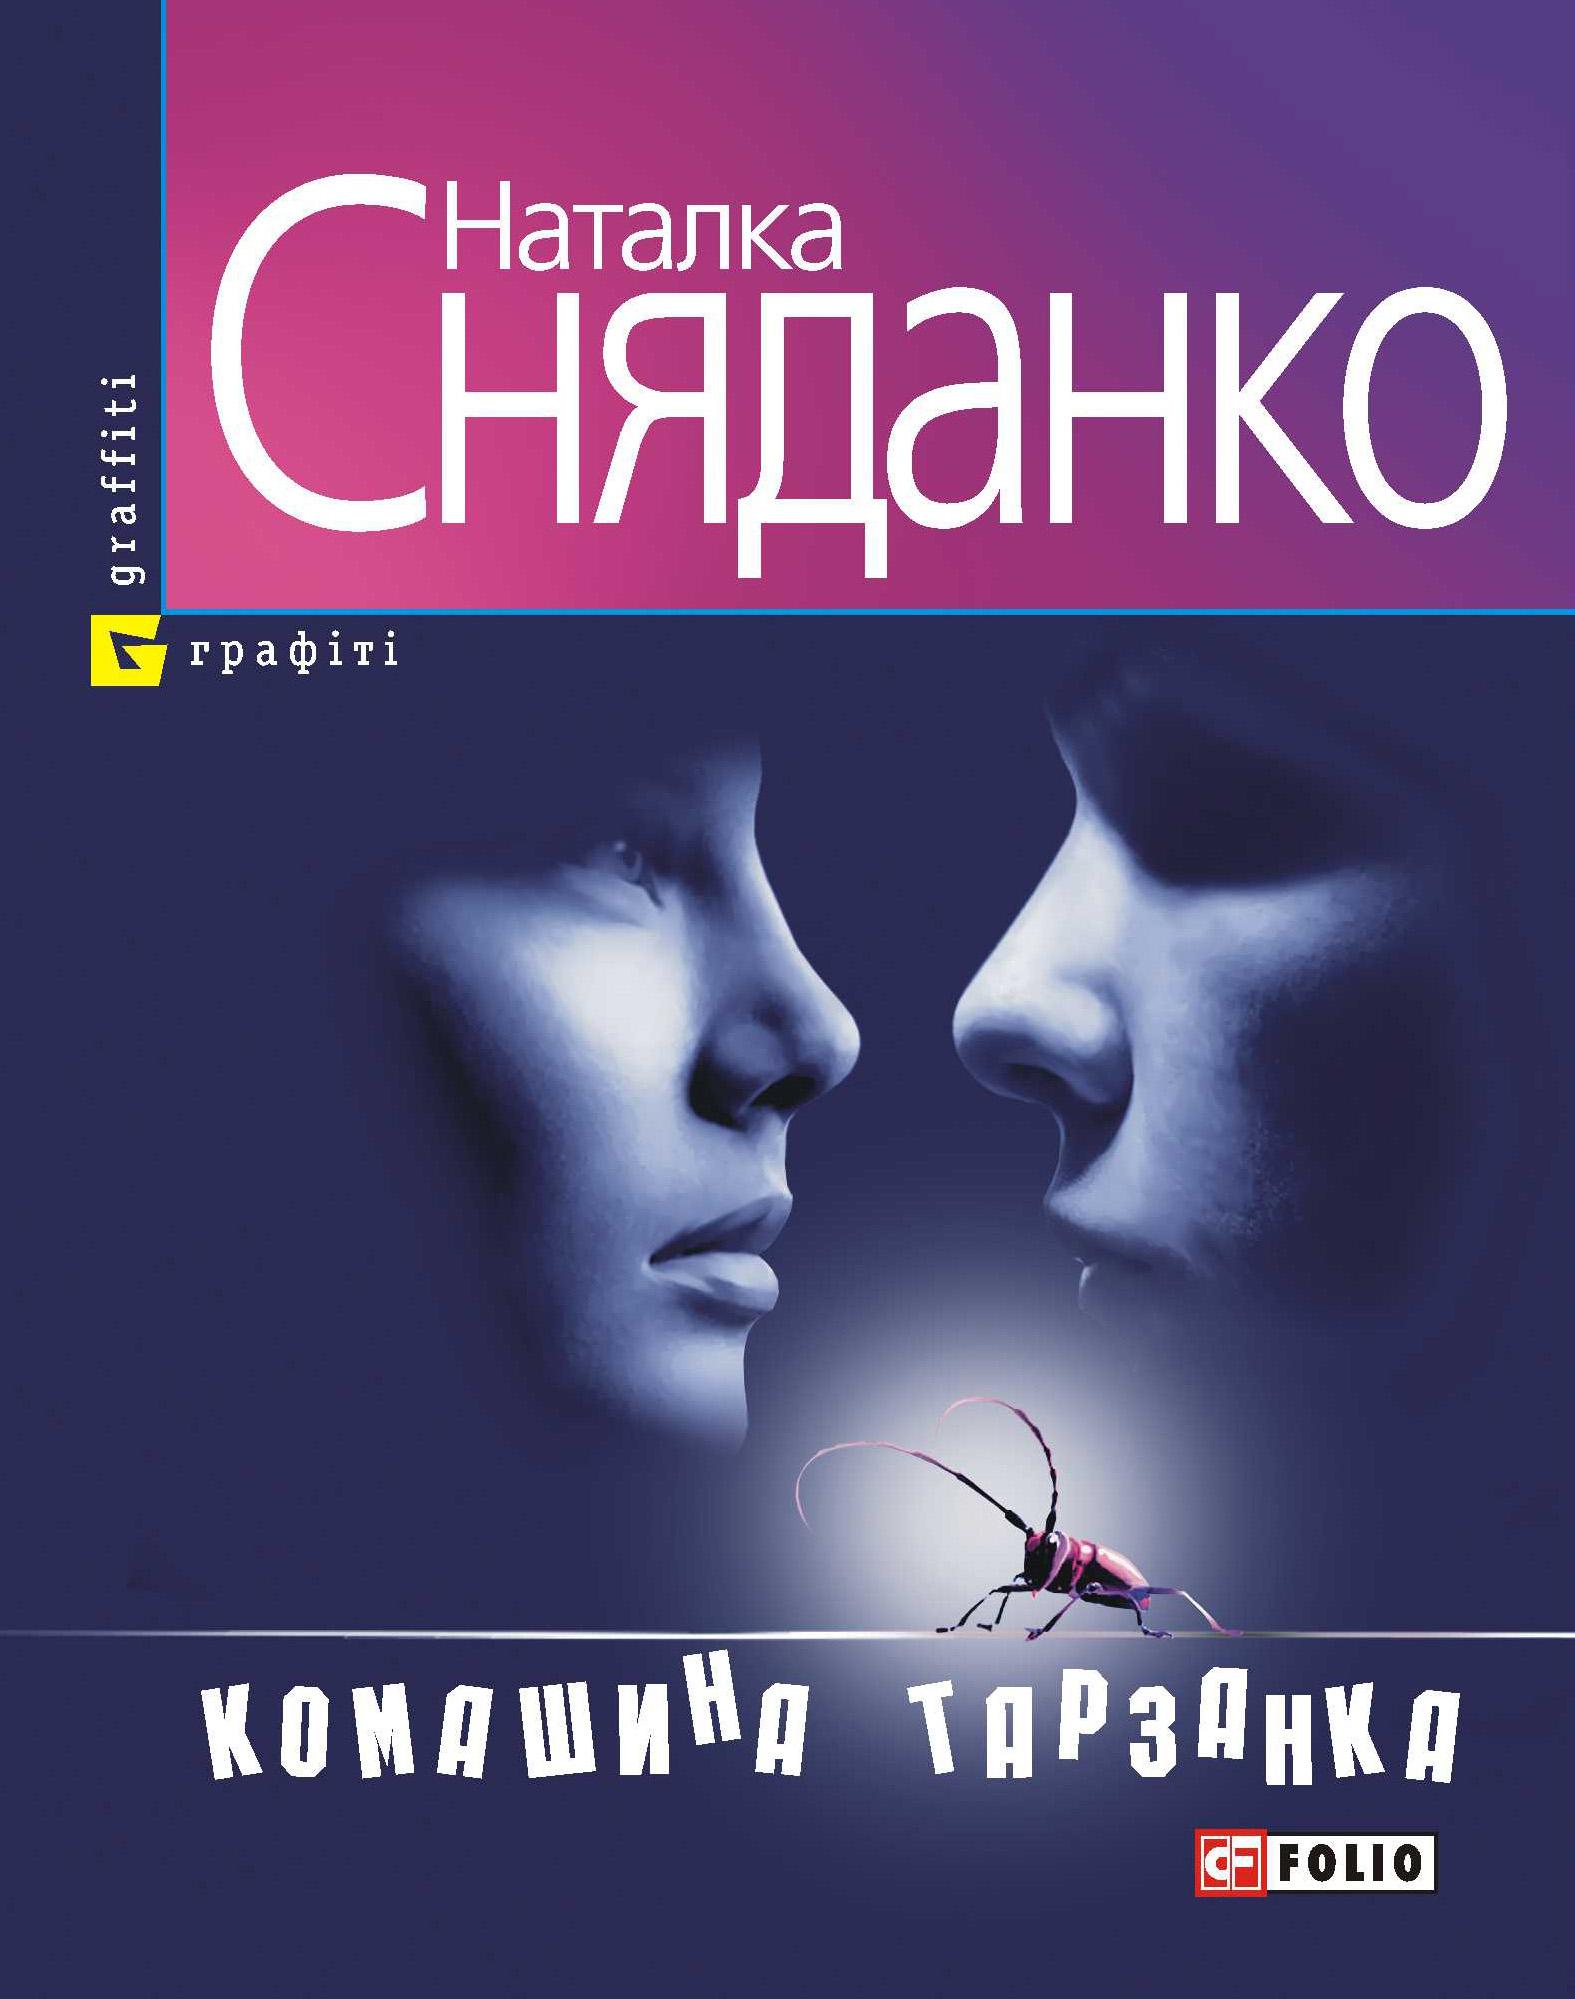 Наталья Сняданко Комашина тарзанка (збірник)